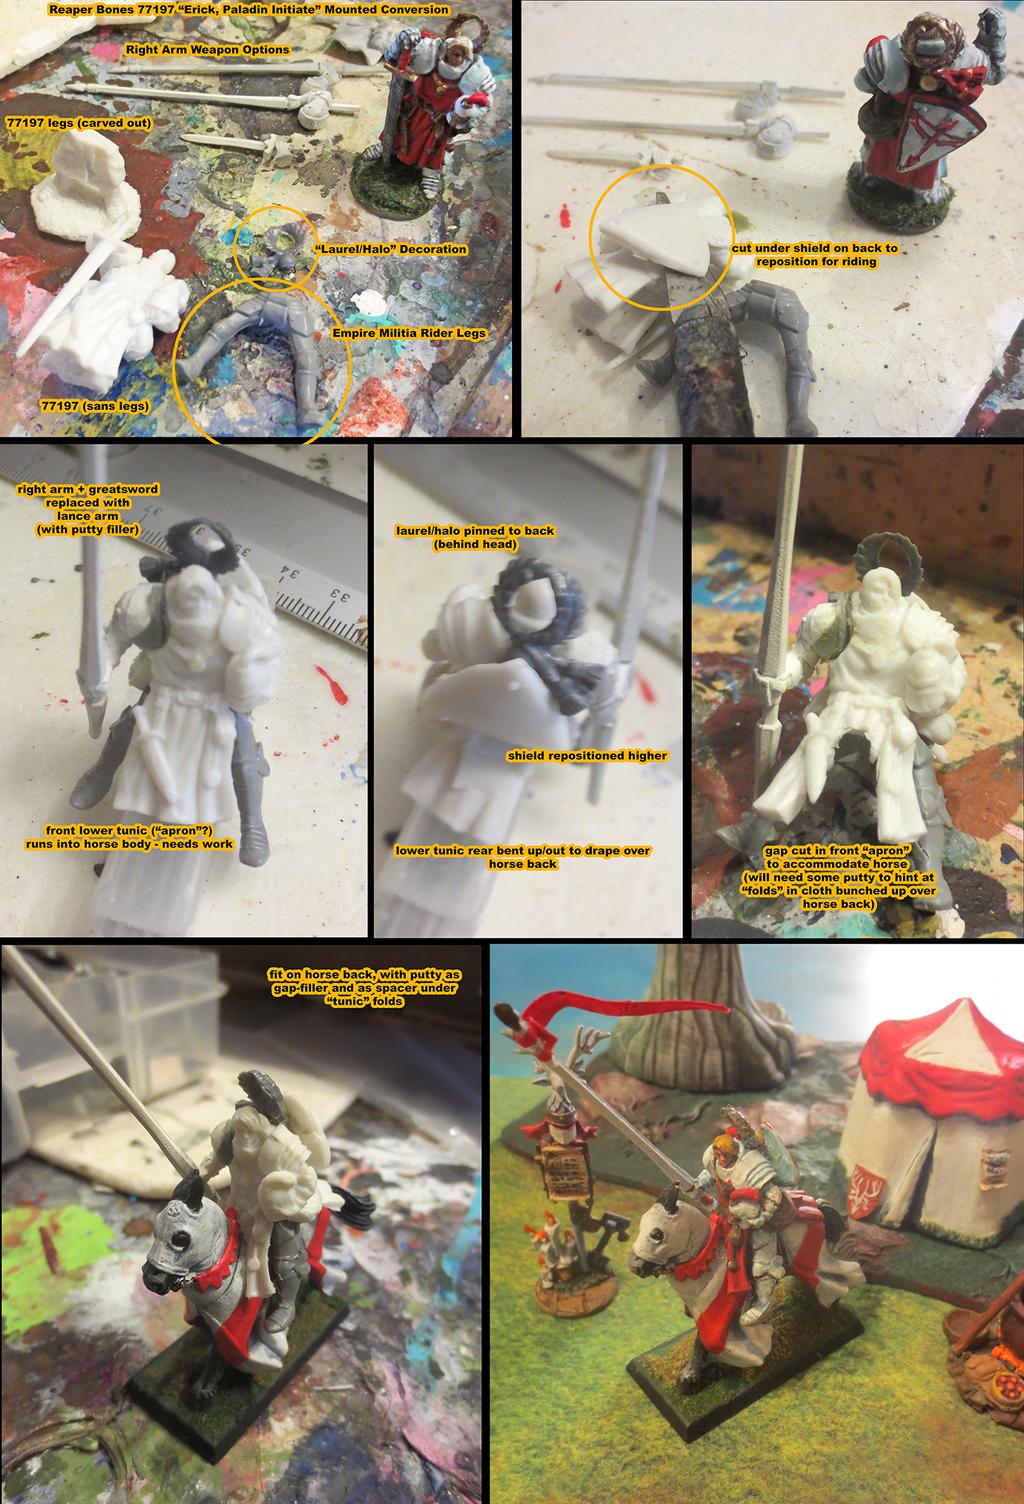 Kingmaker: Paladin Riding Model Conversion by JordanGreywolf